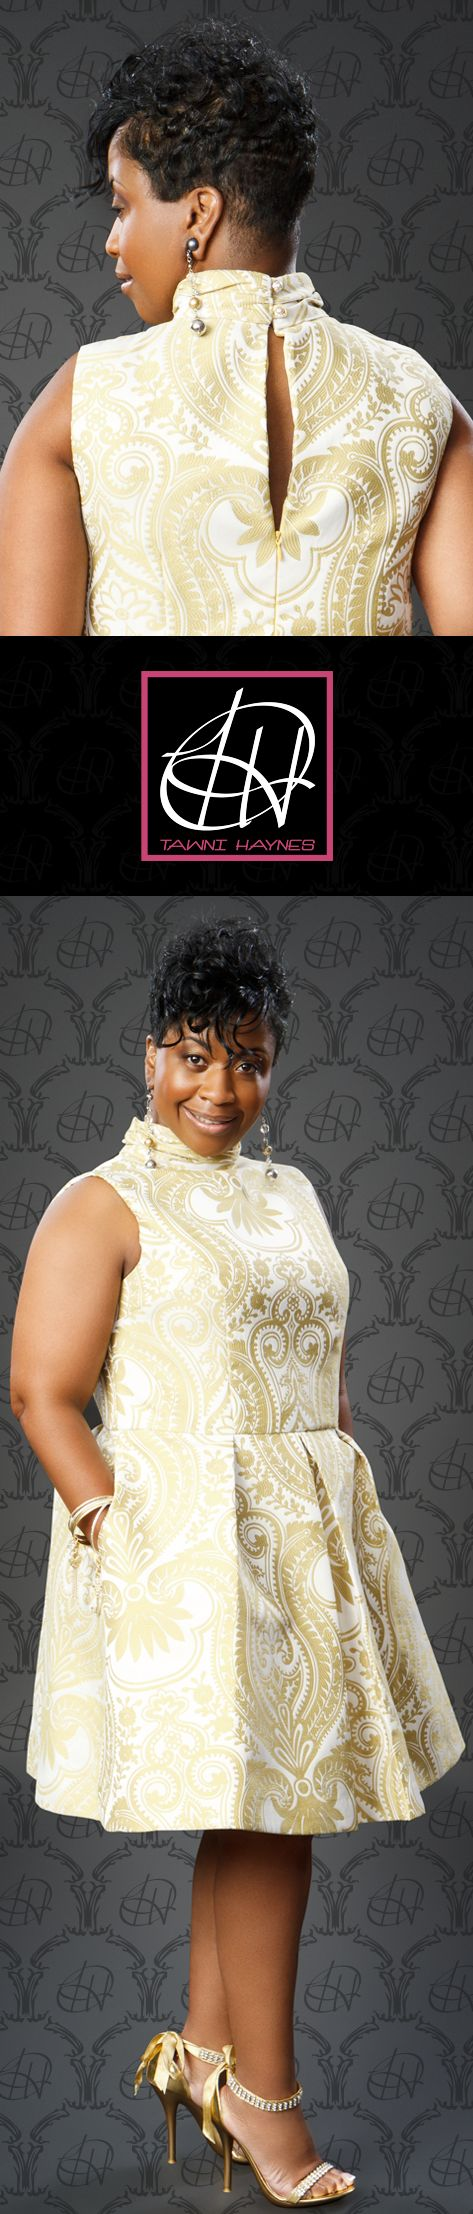 Tawni Haynes Custom Made Gold on Cream Sleeveless Brocade Damask Pleated Dress. Tawni Haynes 972-754-5096 www.facebook.com/TawniHaynesCustomApparel